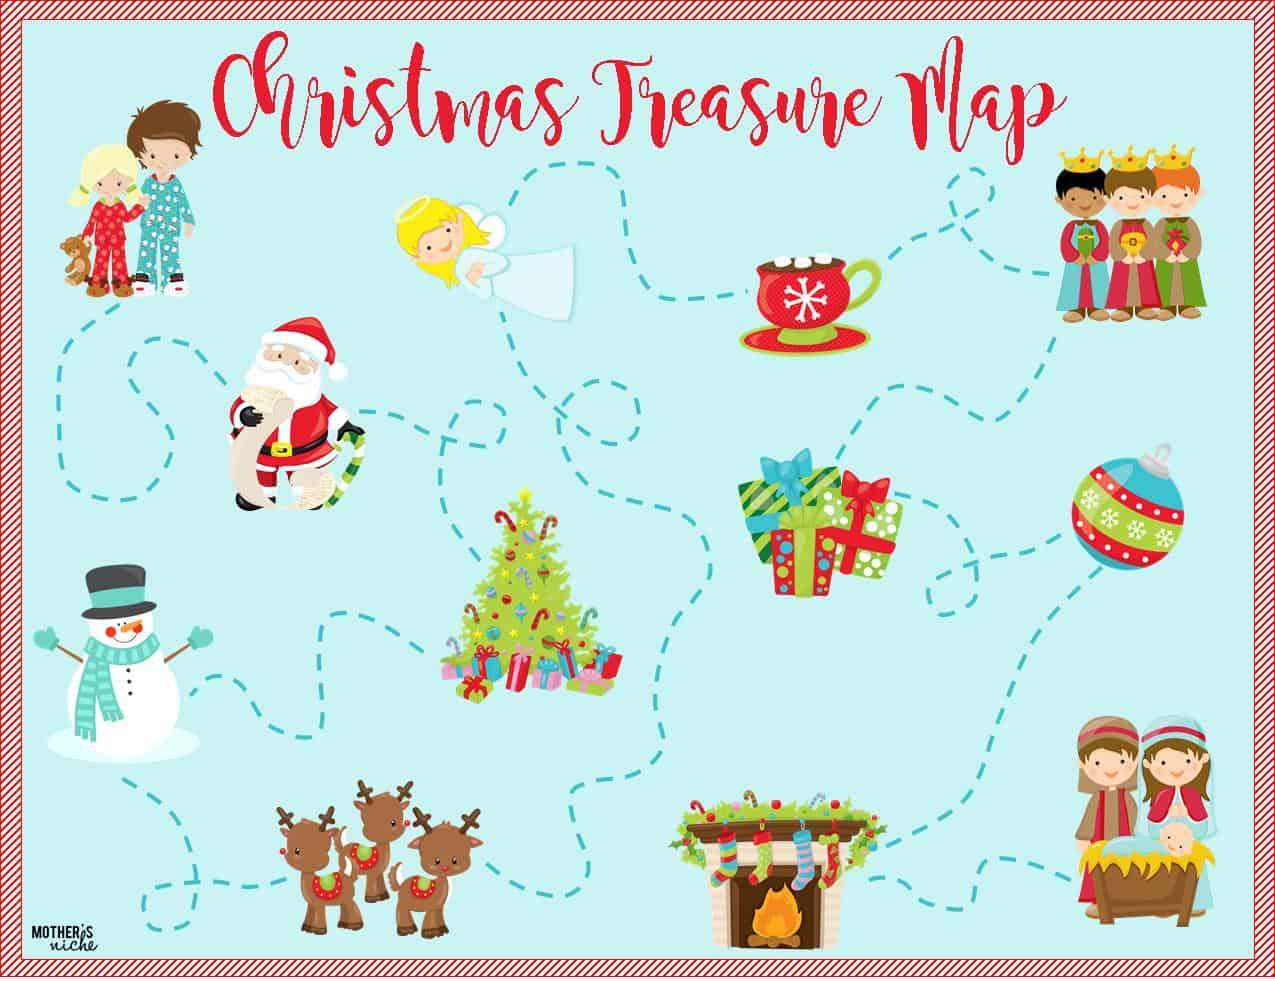 CHRISTMAS TREASURE MAP: FREE PRINTABLE Map and Clues